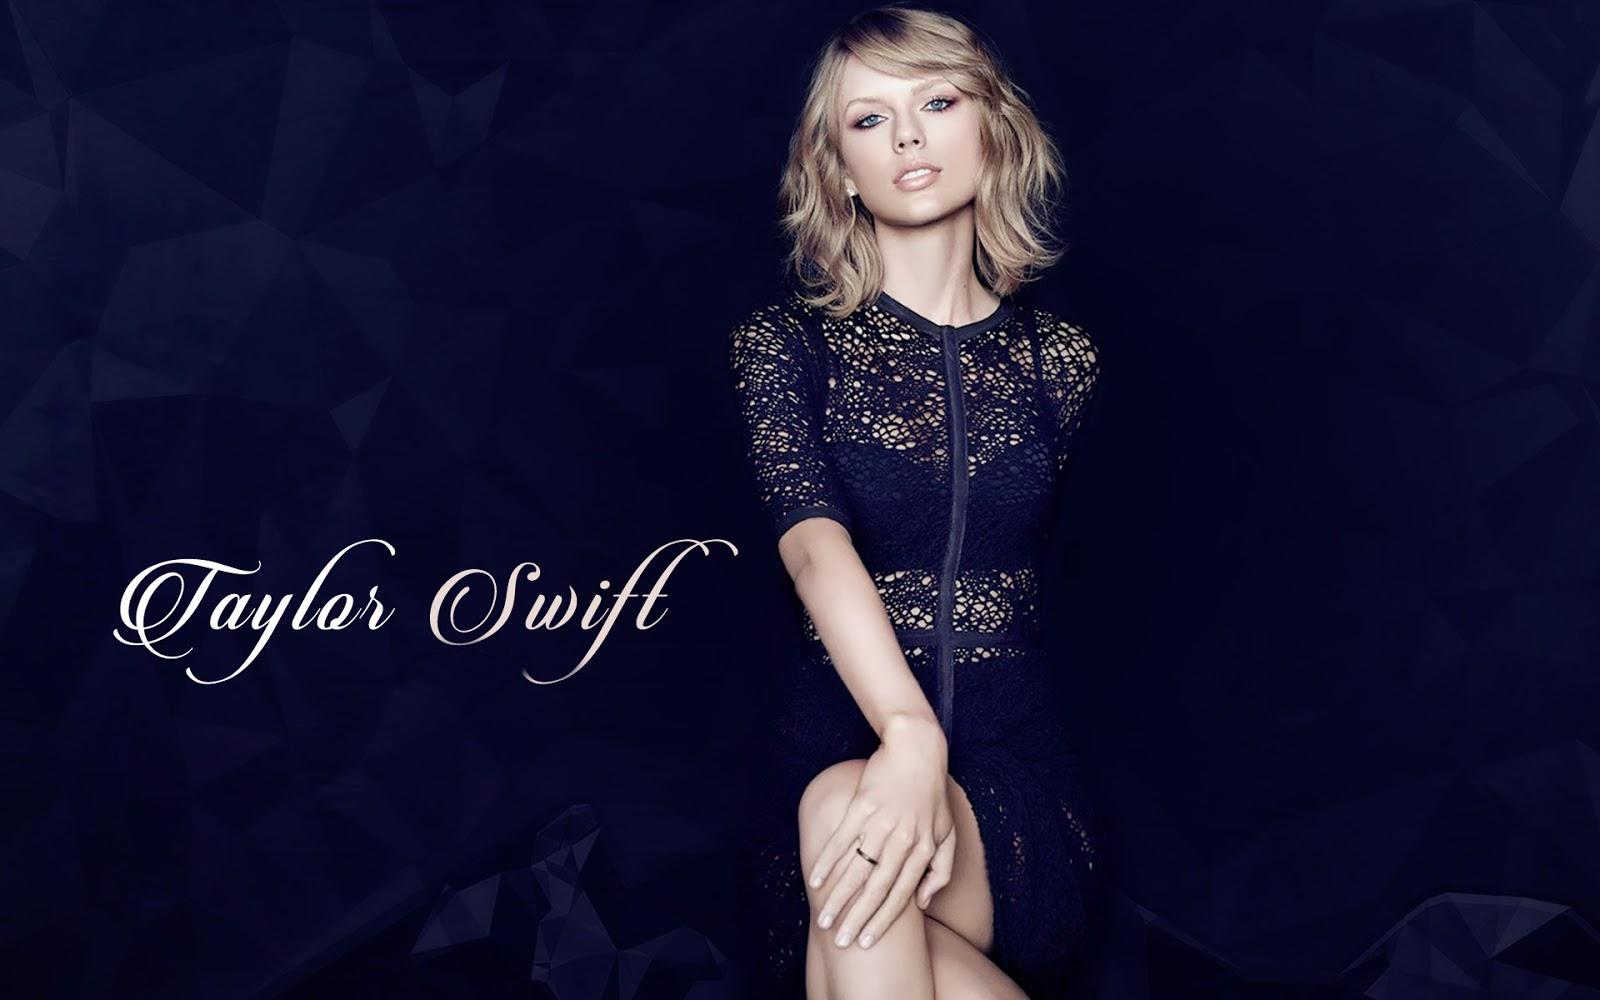 Taylor Swift Black Dress Beautiful Wallpaper